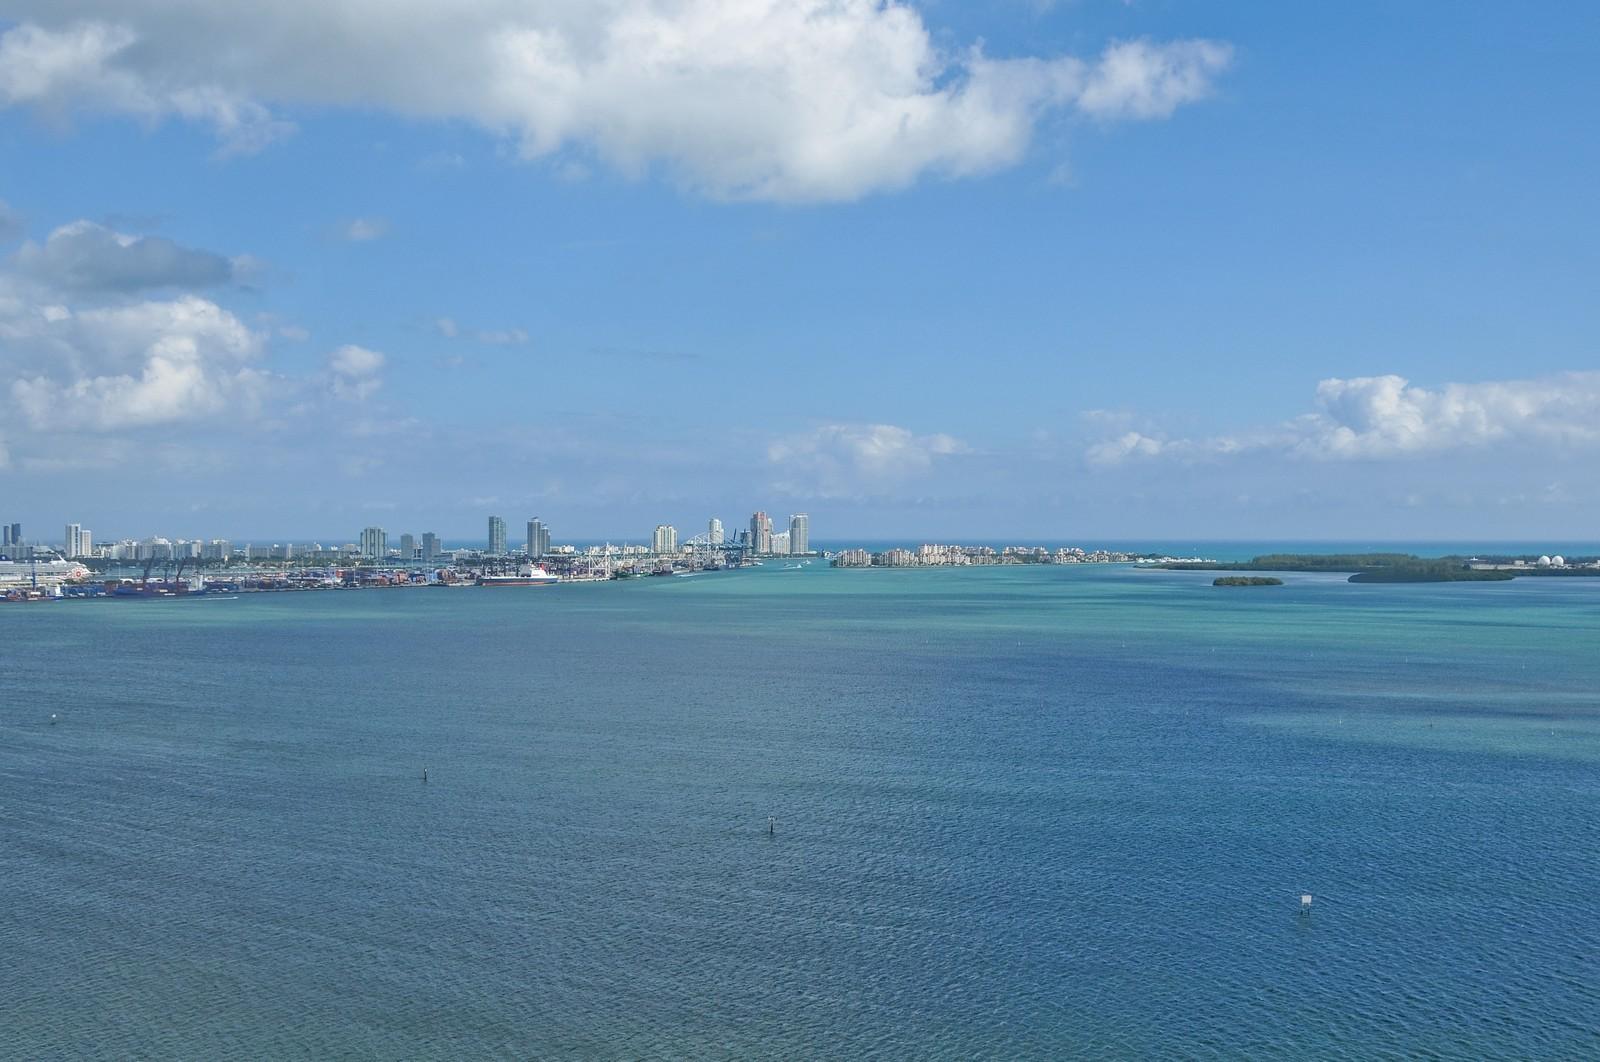 Real Estate Photography - 218 SE 14th St, PH 2, Miami, FL, 33131 - View